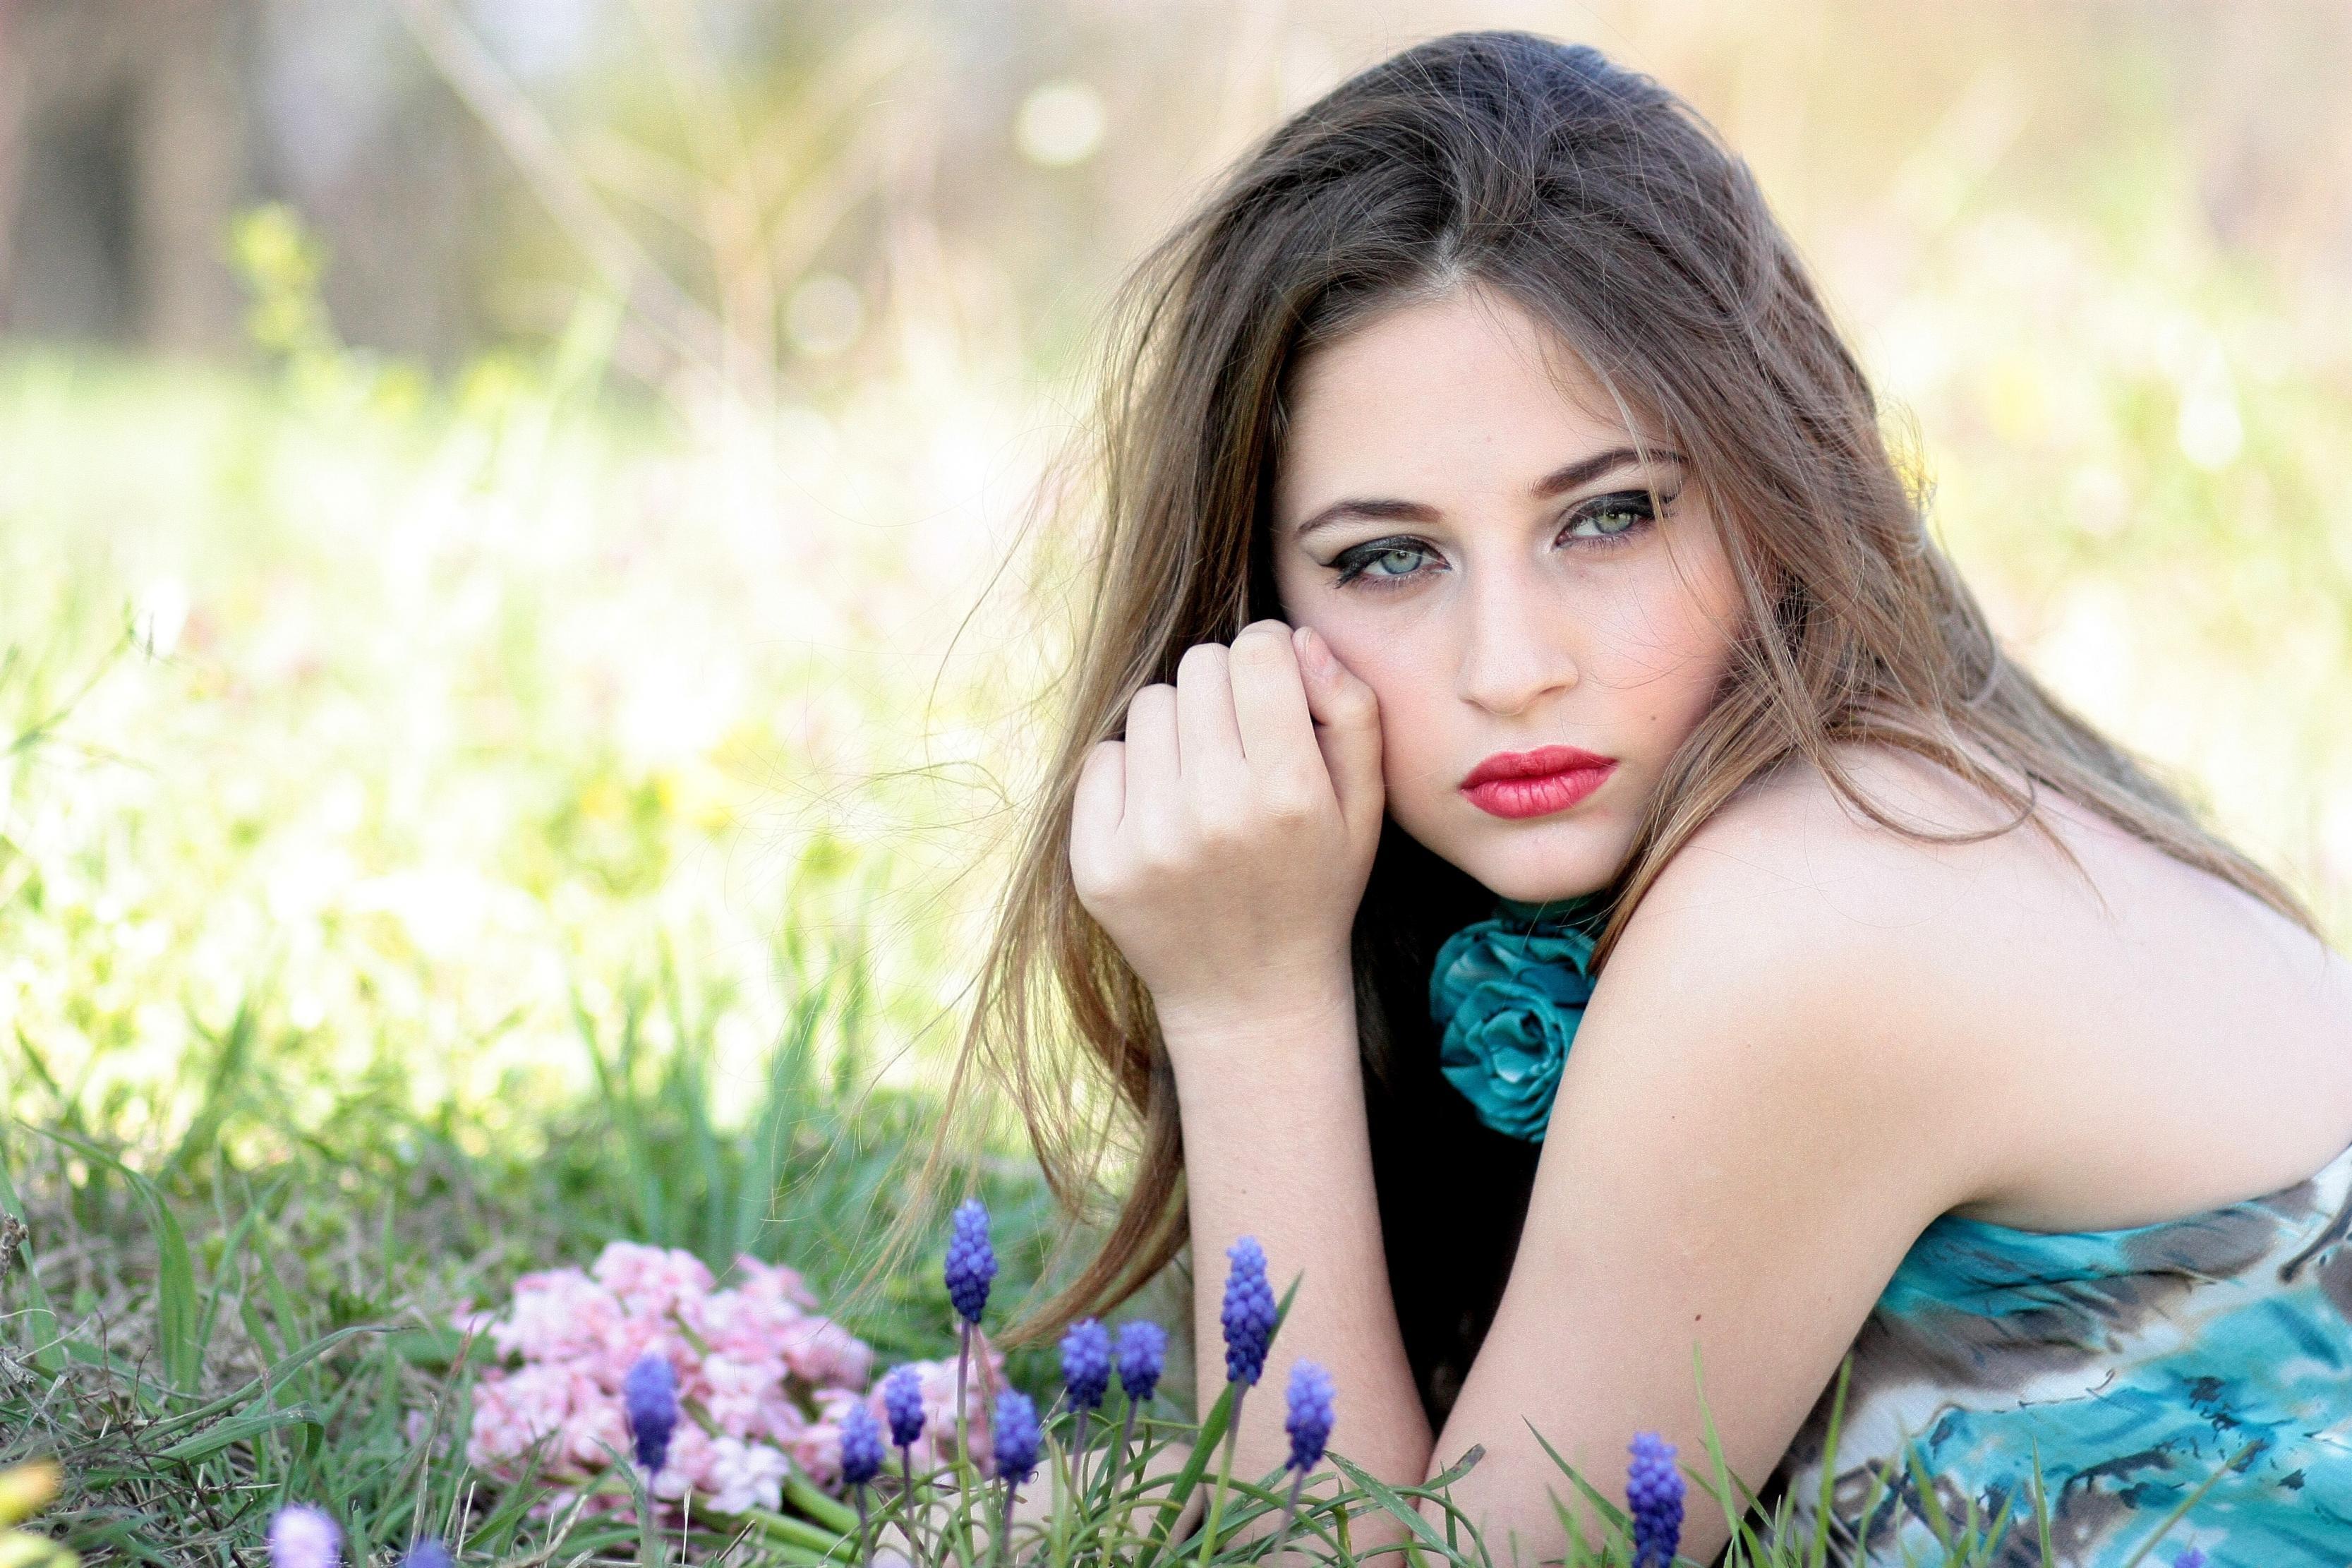 صورة صور بنات دلع , اجمل صور لبنات دلع